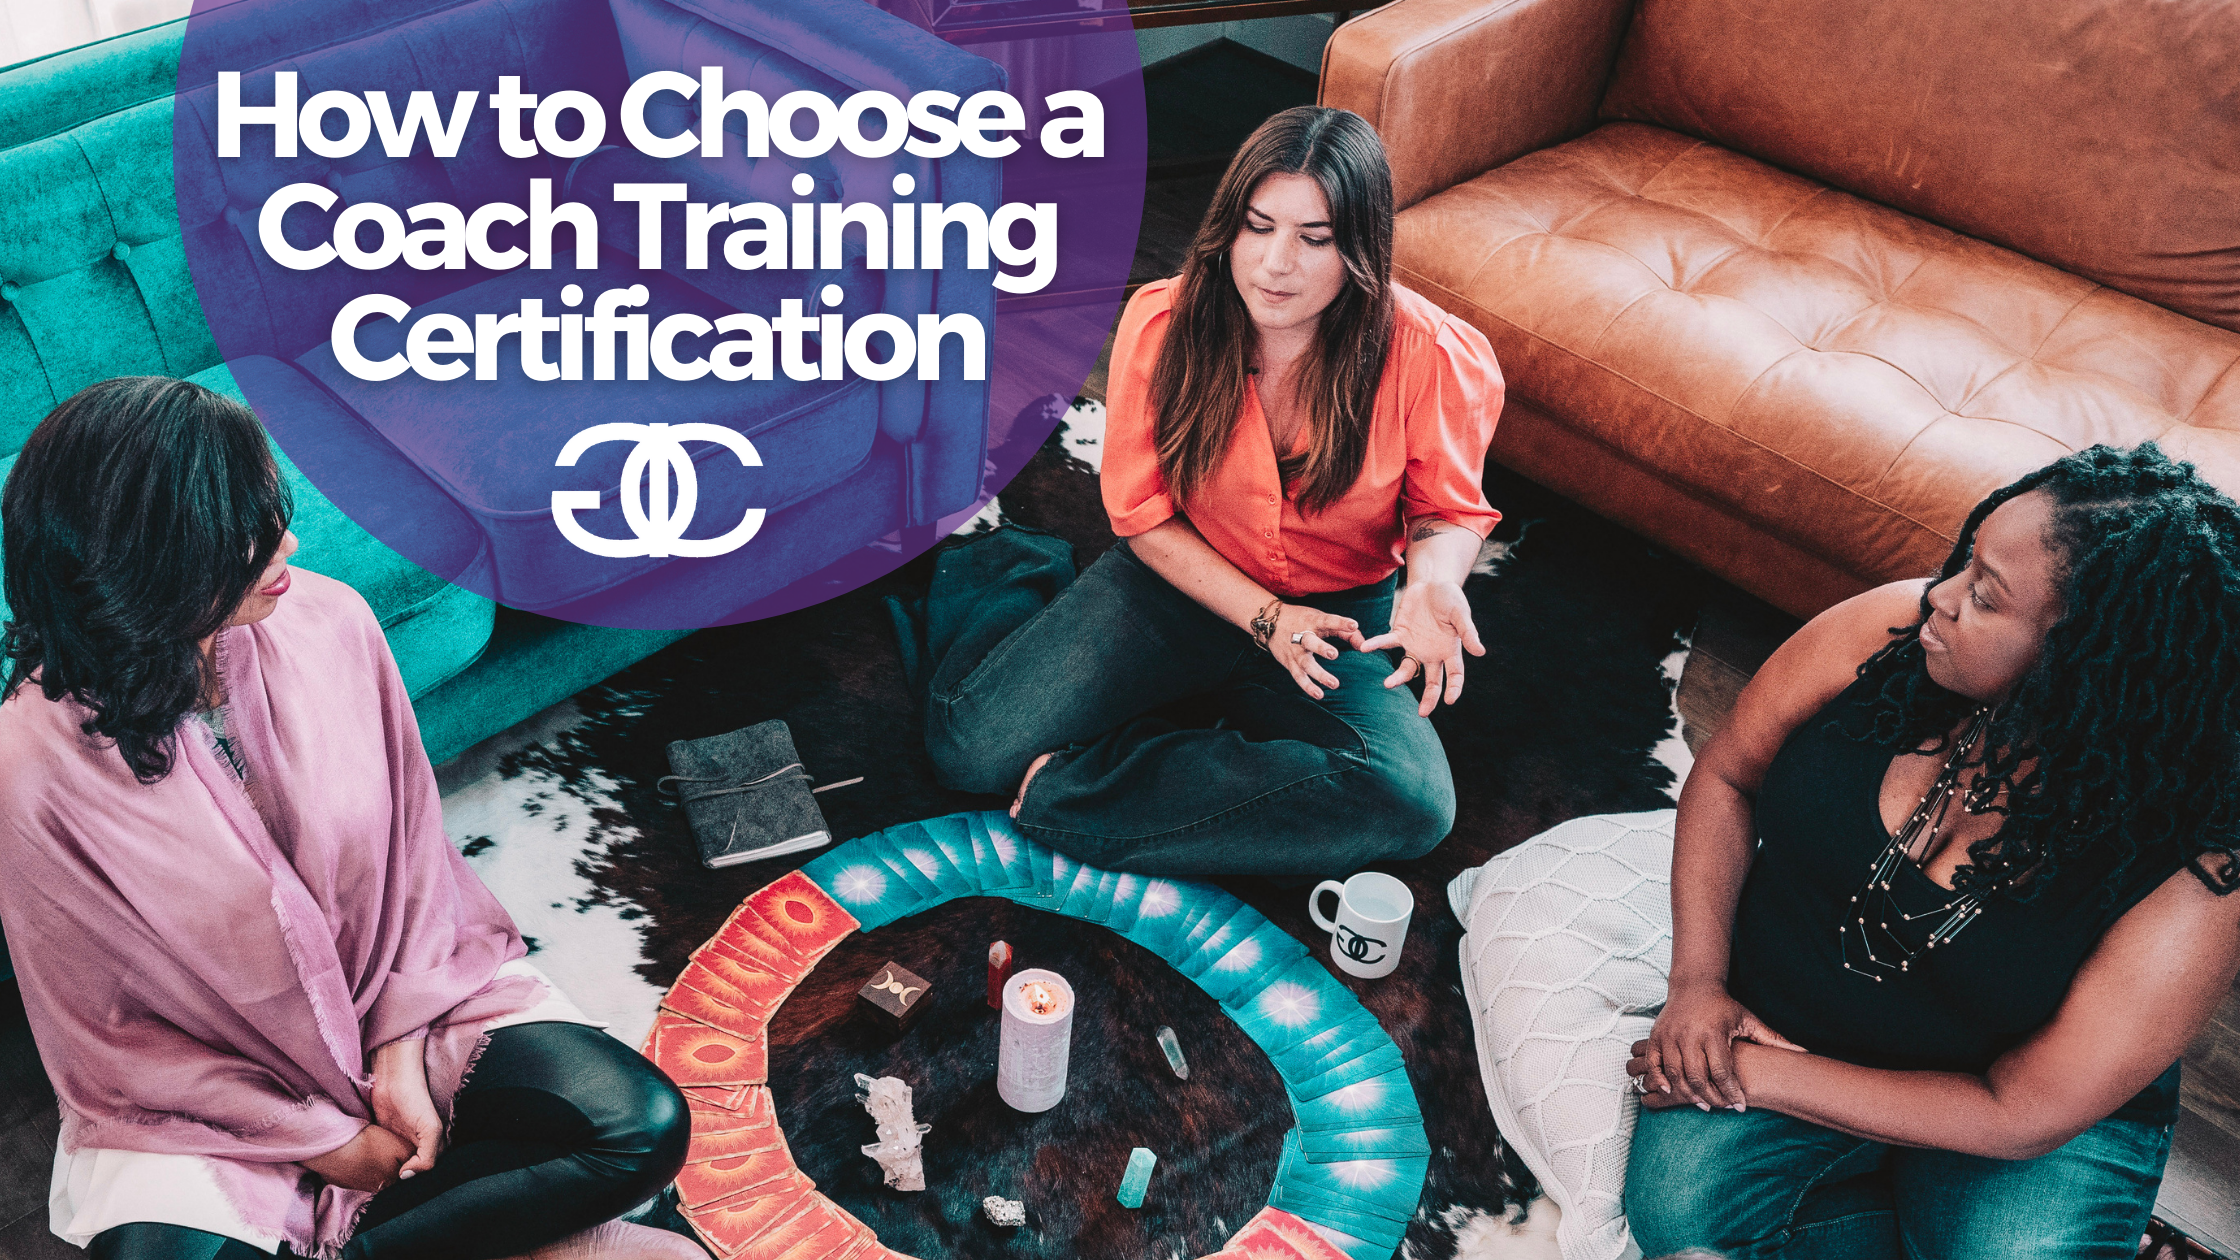 choosing a coach training certification